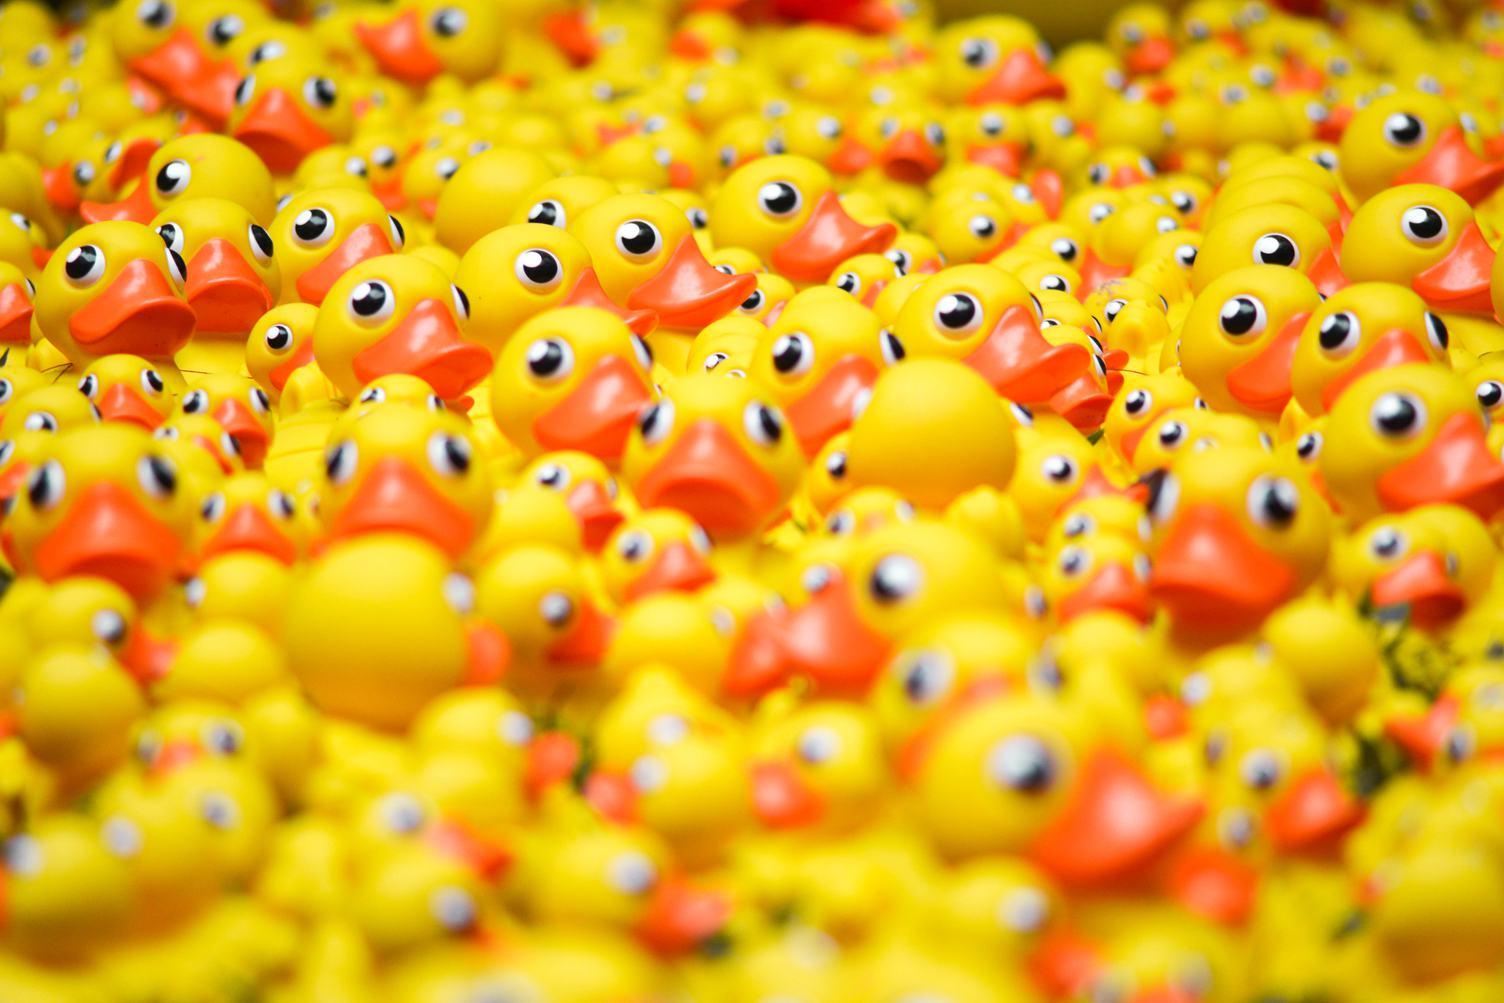 Plenty of Yellow Rubber Ducks